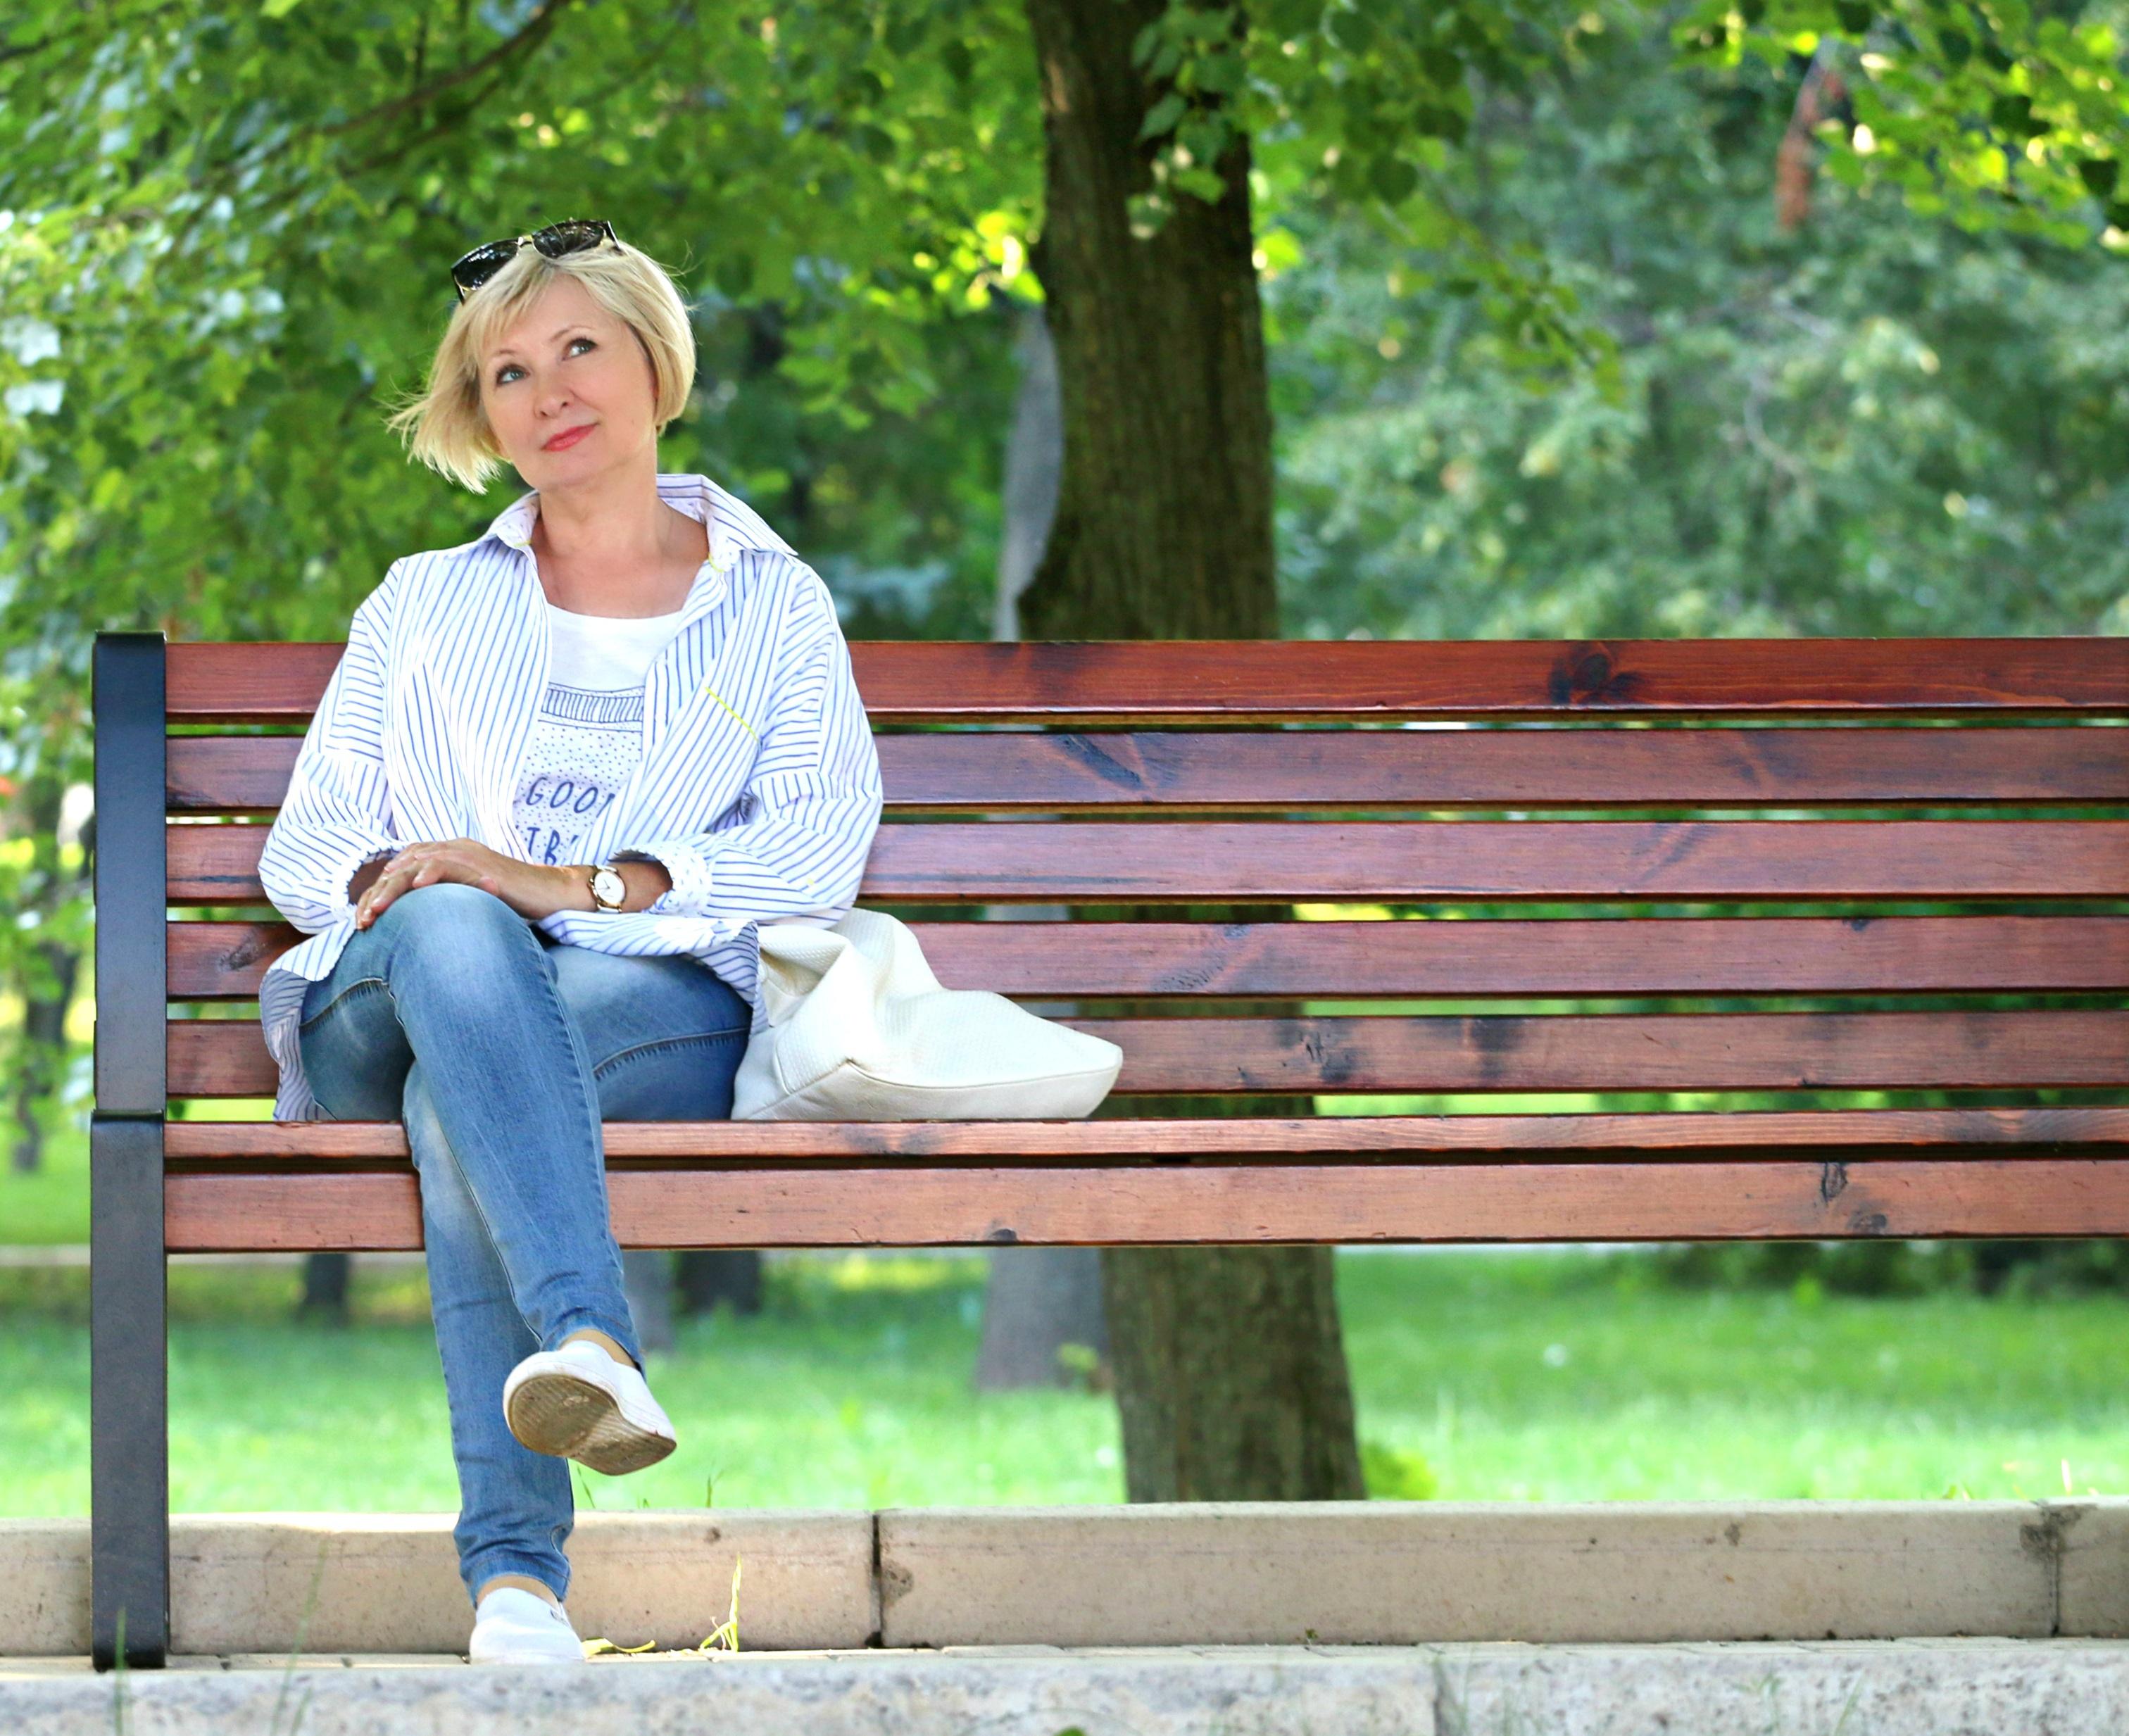 mujer rubia banco parque